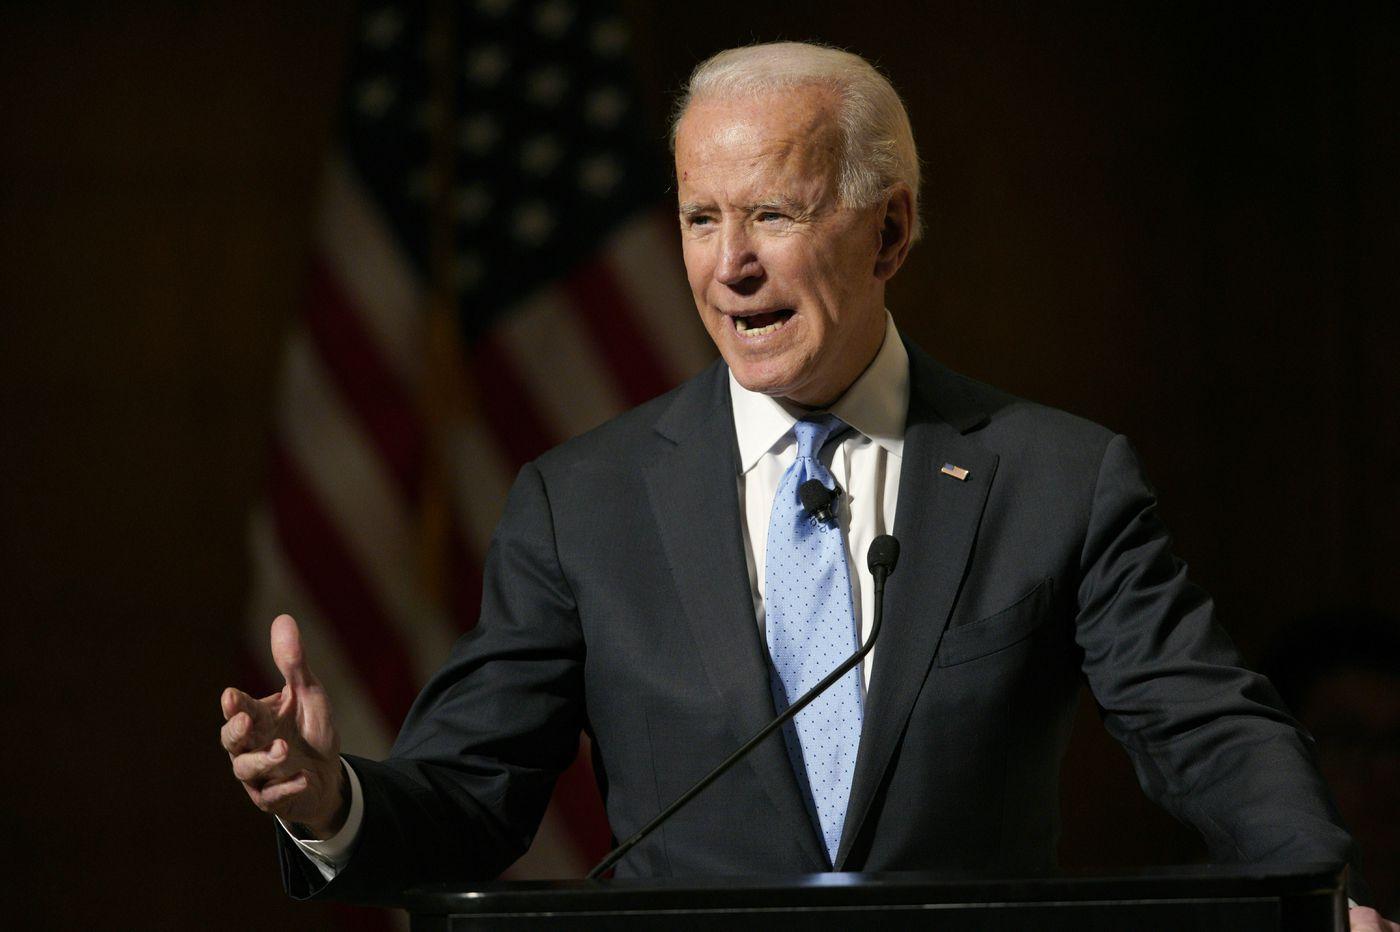 Joe Biden wants to make defense of democracies the crux of U.S. foreign policy | Trudy Rubin